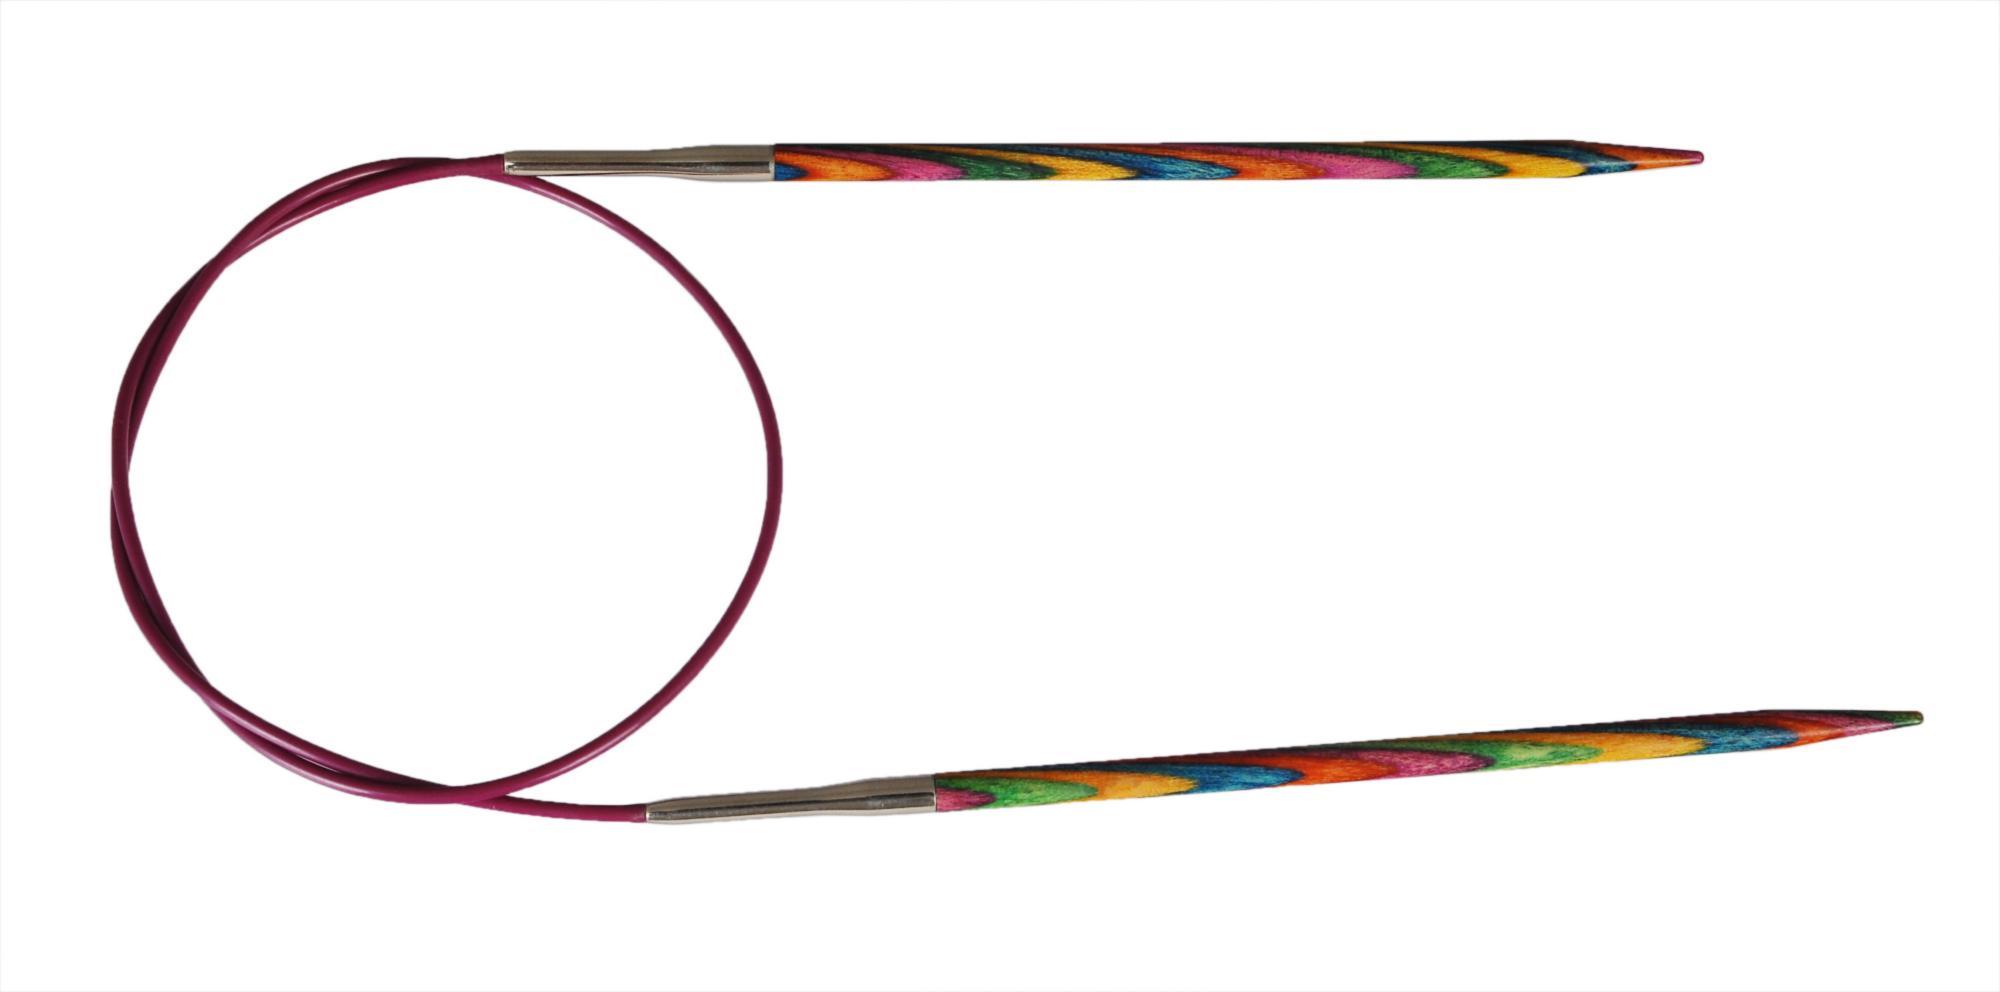 Спицы круговые 60 см Symfonie Wood KnitPro, 20322, 2.25 мм